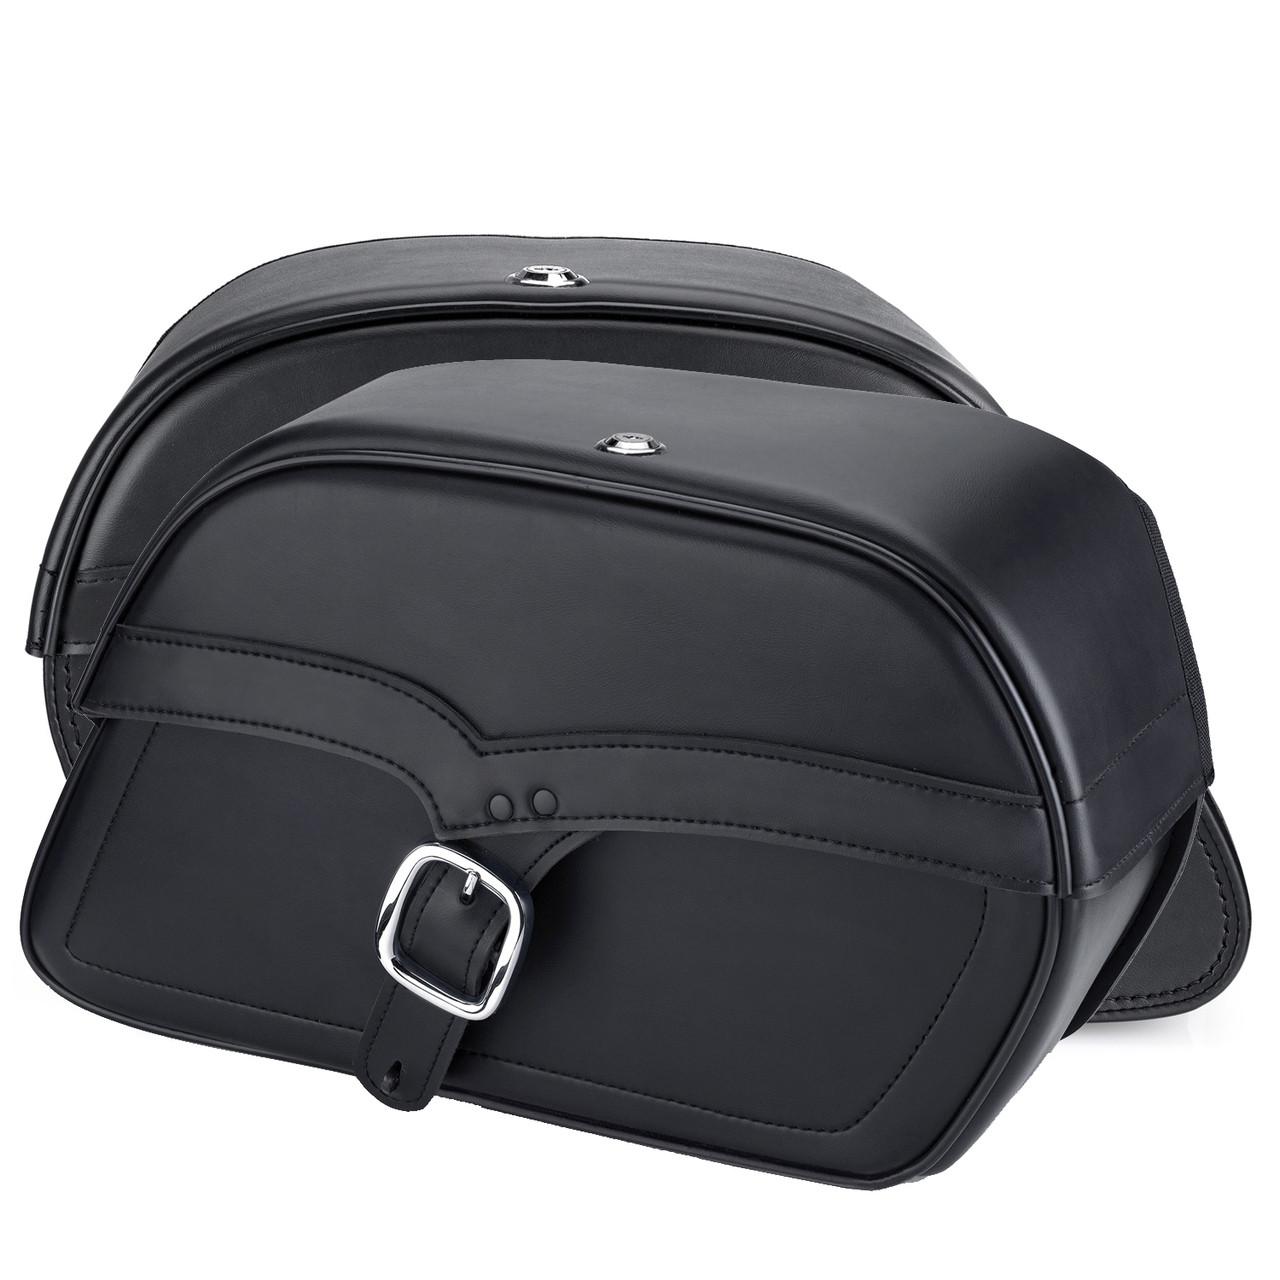 Vikingbags Shock Cutout Single Strap Large Slanted Saddlebags Both bags View